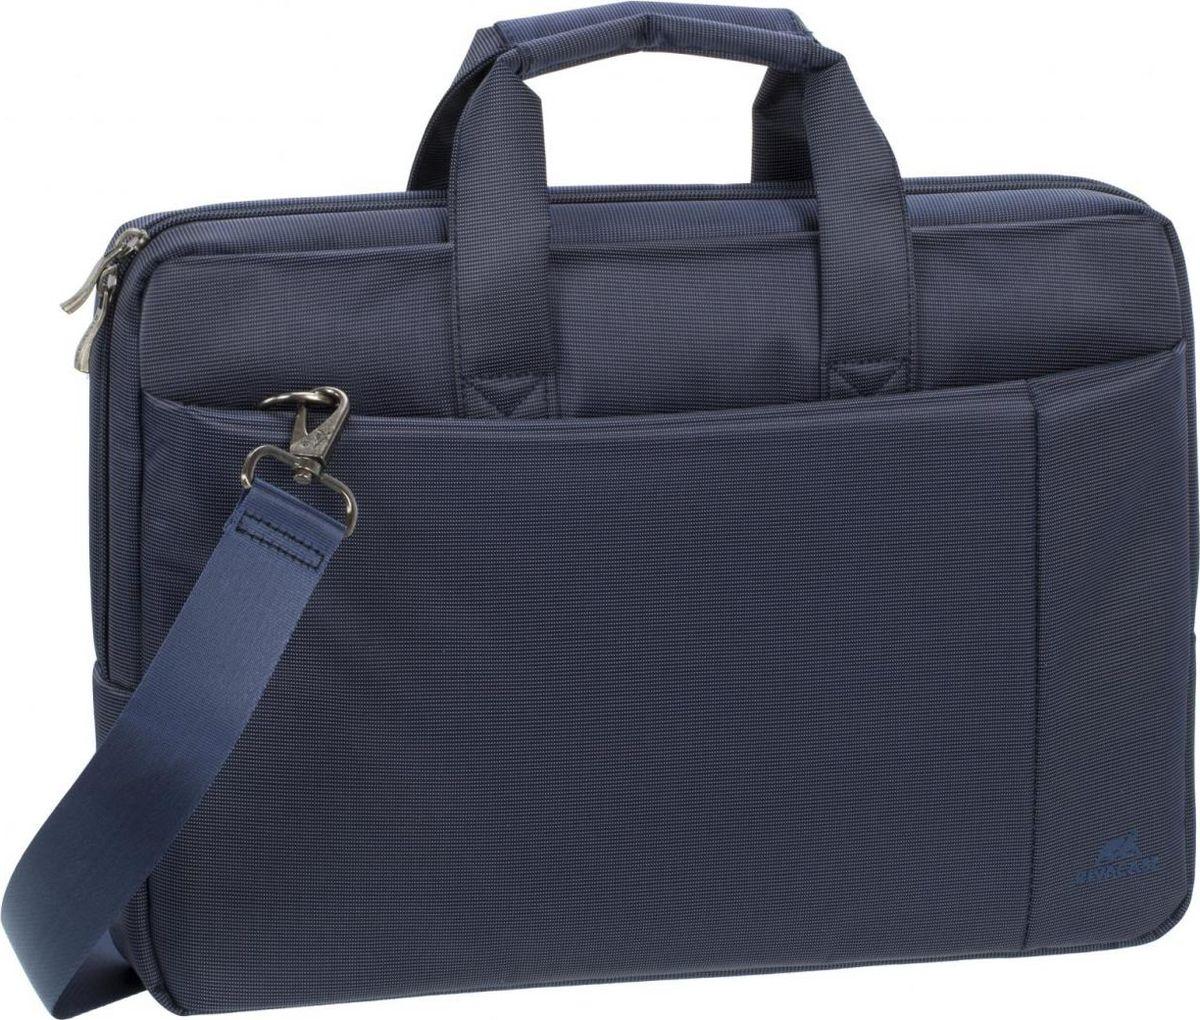 RivaCase 8231, Blue сумка для ноутбука 15,6